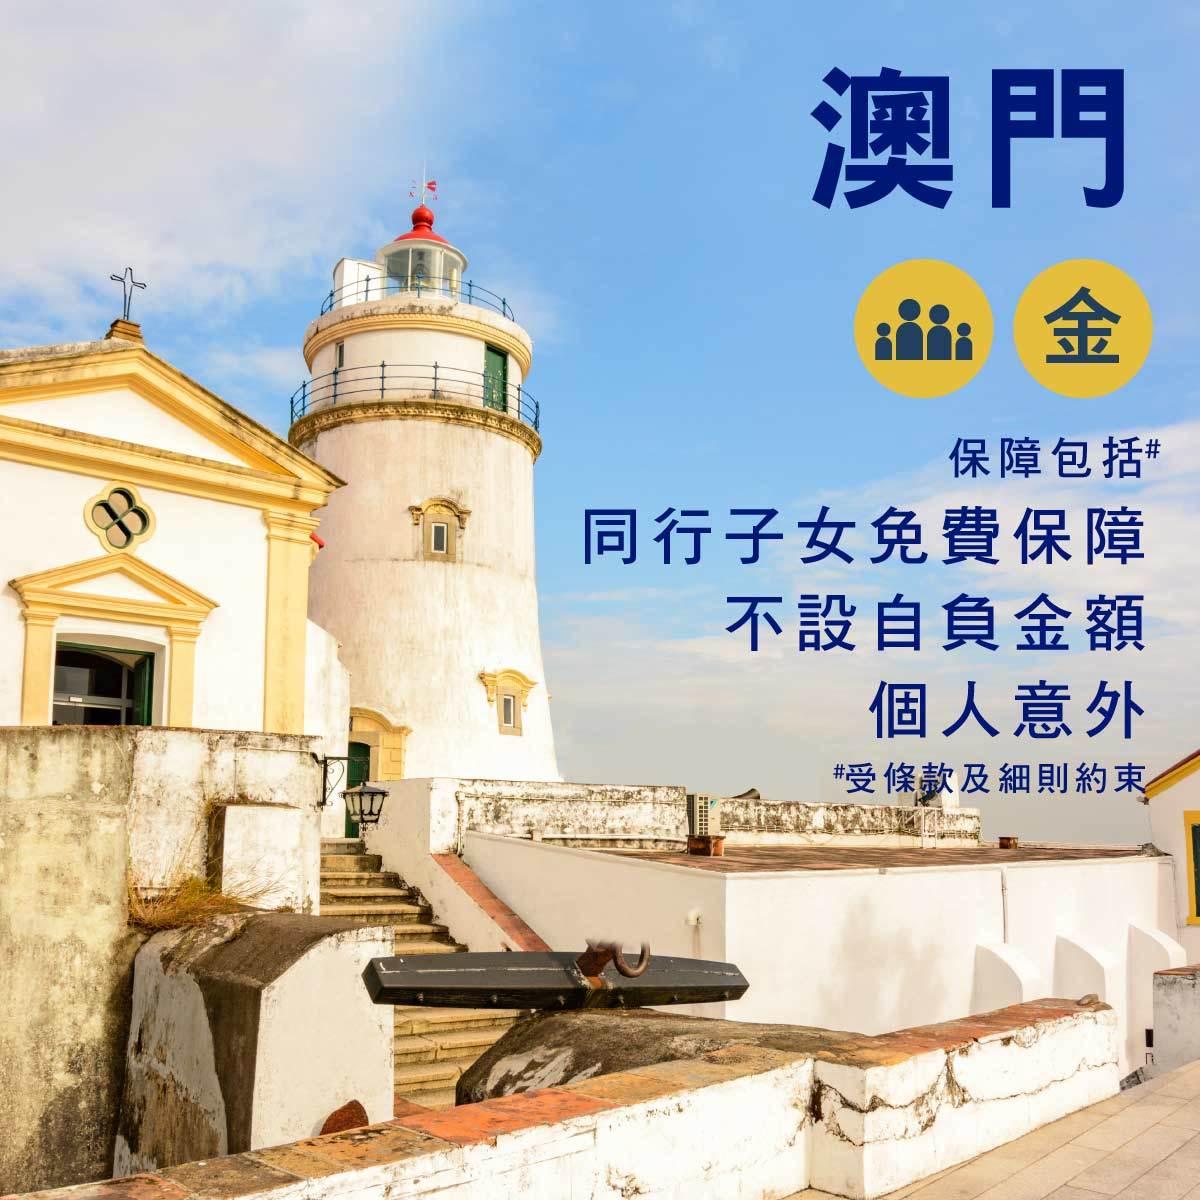 Macau - Single Trip Family Travel Insurance